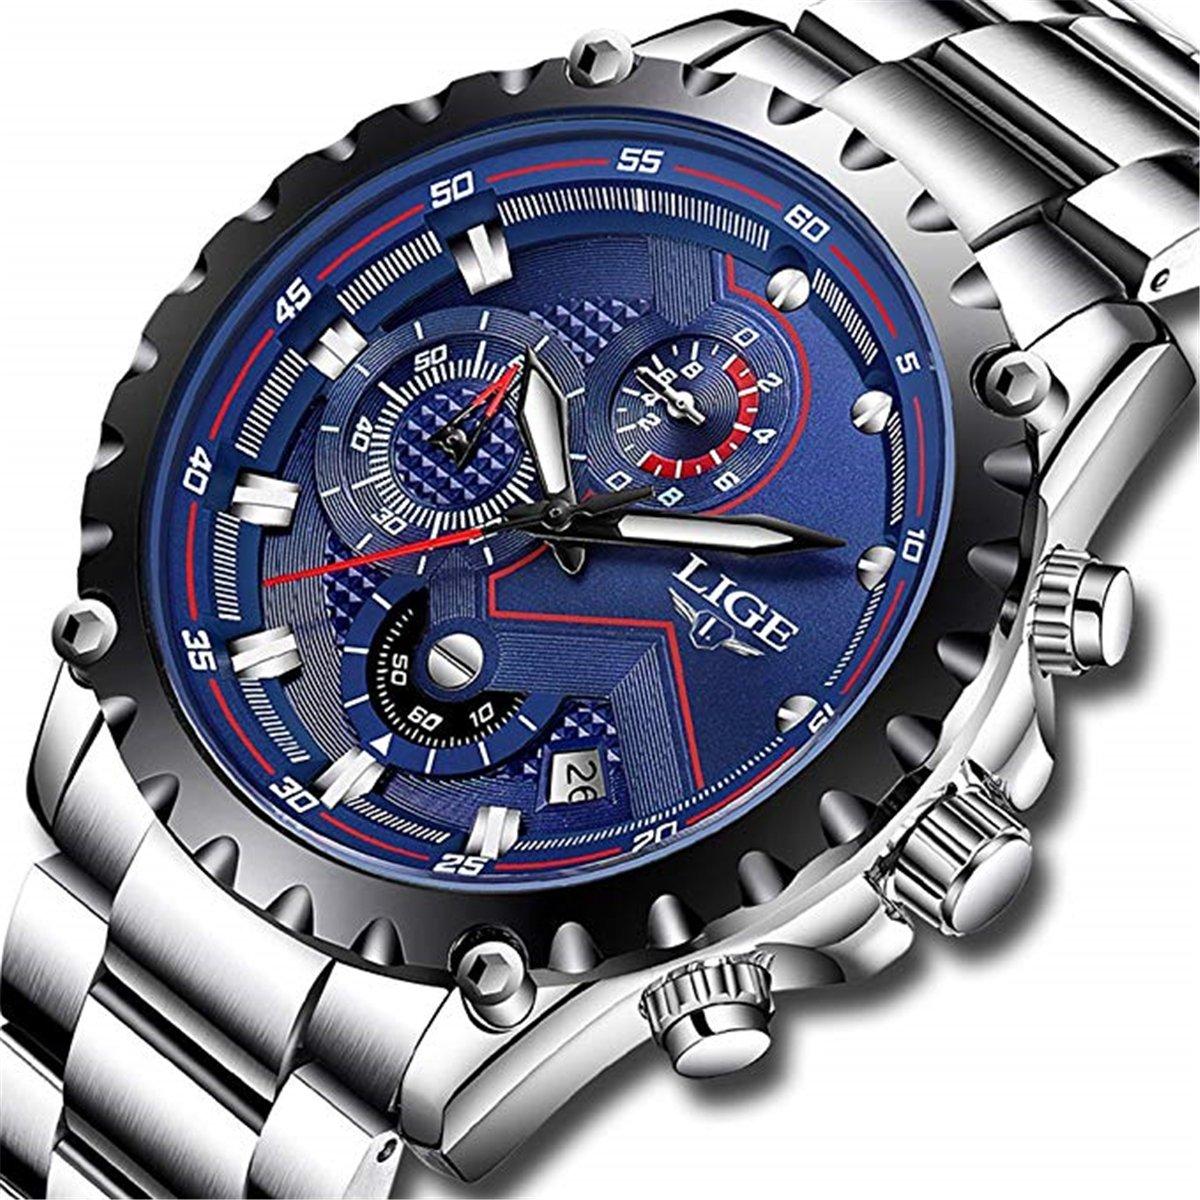 Herren-Uhren-Fashion-Sports-Analog-Quarz-Armbanduhr-Herren-Luxus-Marke-Lige-Edelstahl-Wasserdicht-Armbanduhr-Man-Casual-Blau-Datum-Geschenk-Armbanduhr